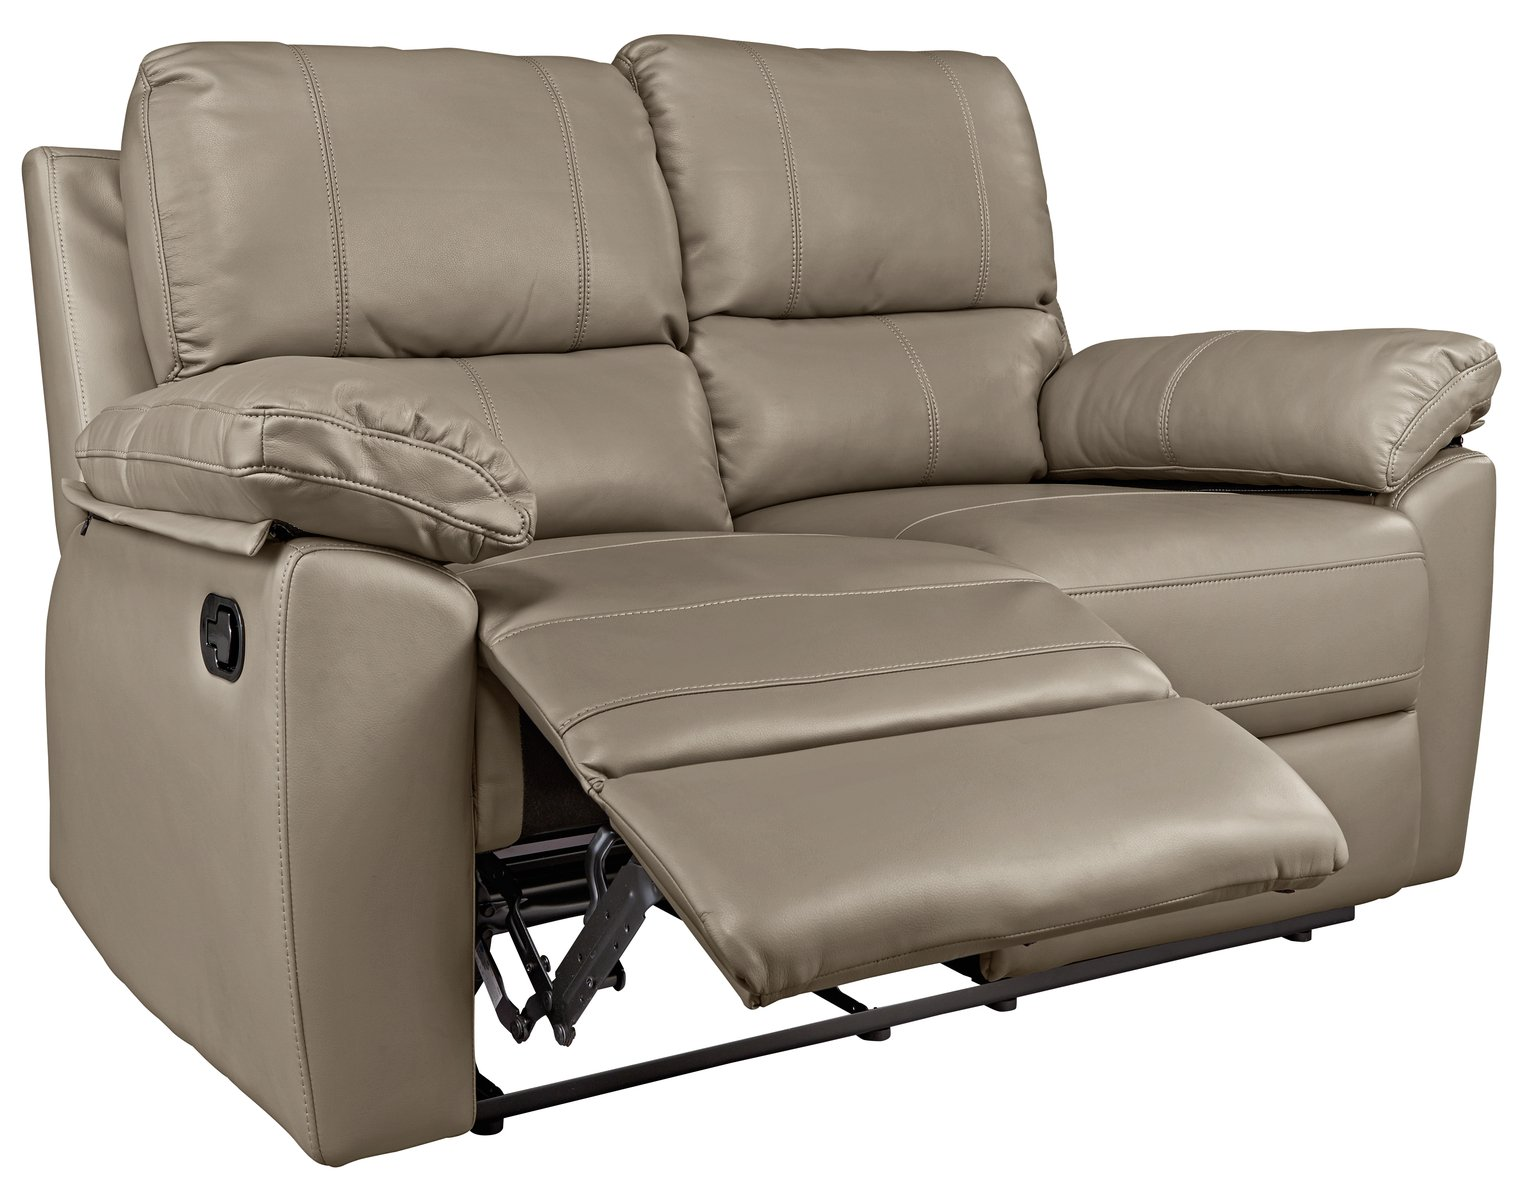 Buy Argos Home Toby 2 Seater Faux Leather Recliner Sofa   Grey   Sofas    Argos